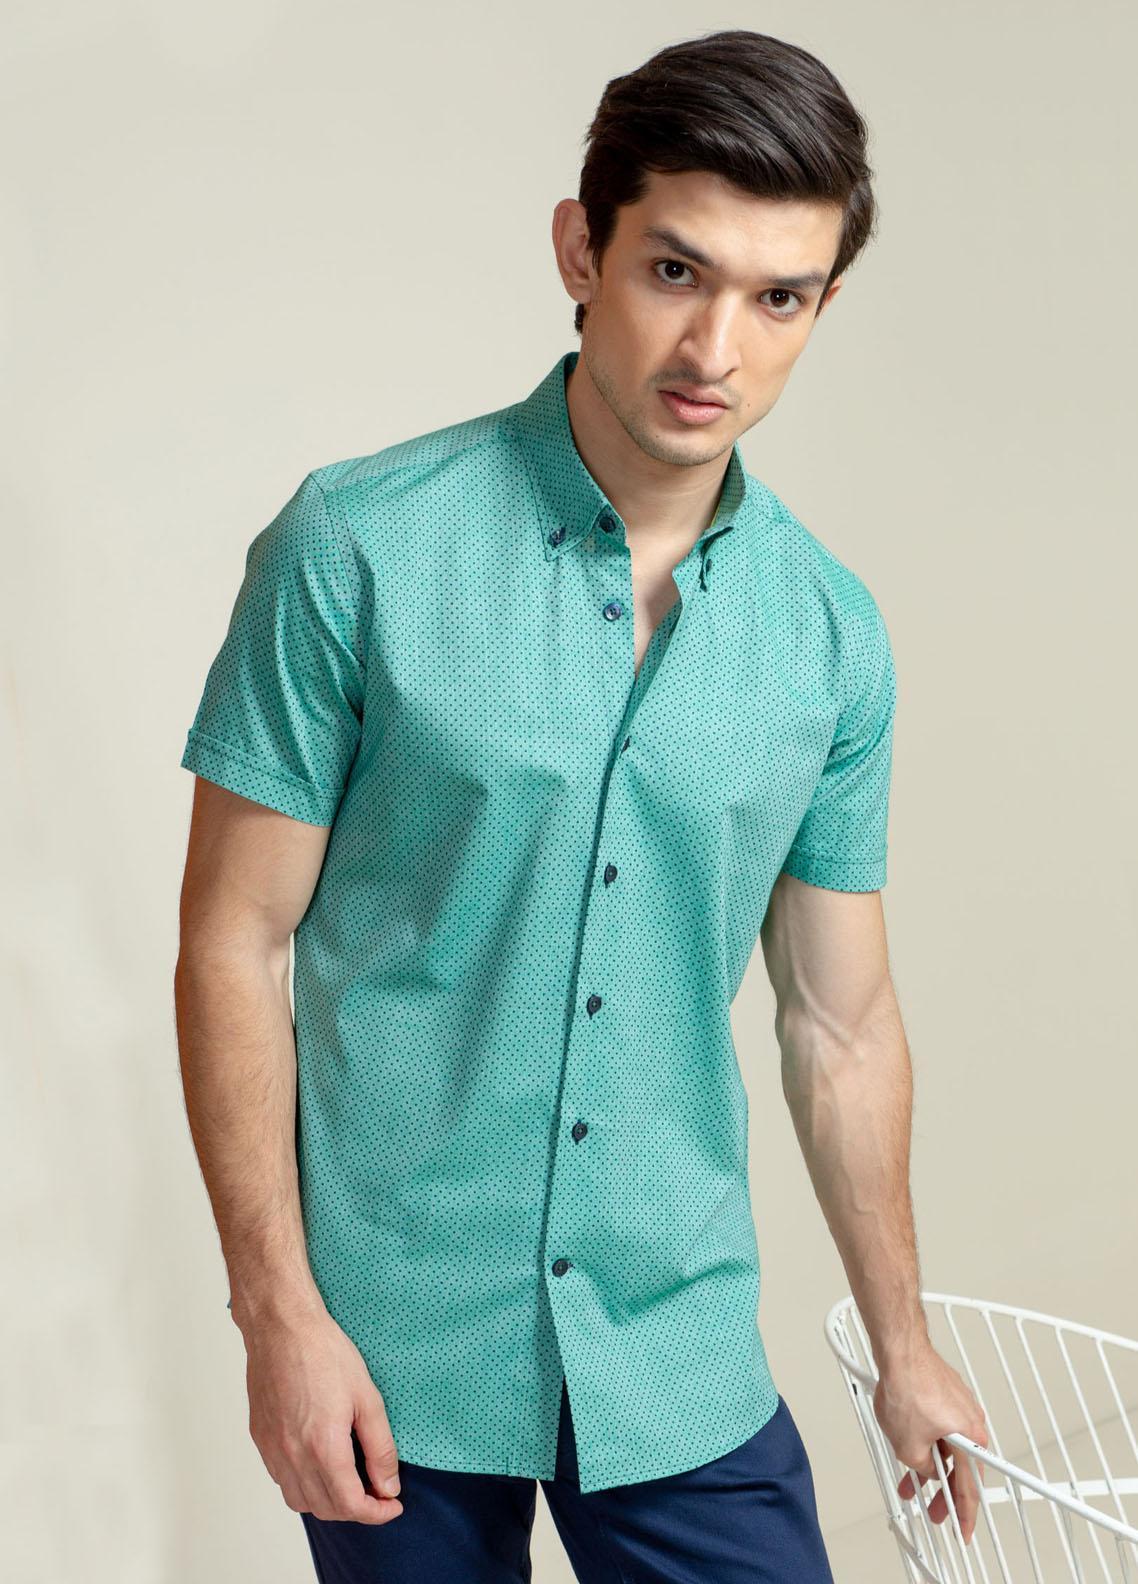 Brumano Cotton Casual Men Shirts -  Green Polka Dot Half Sleeve